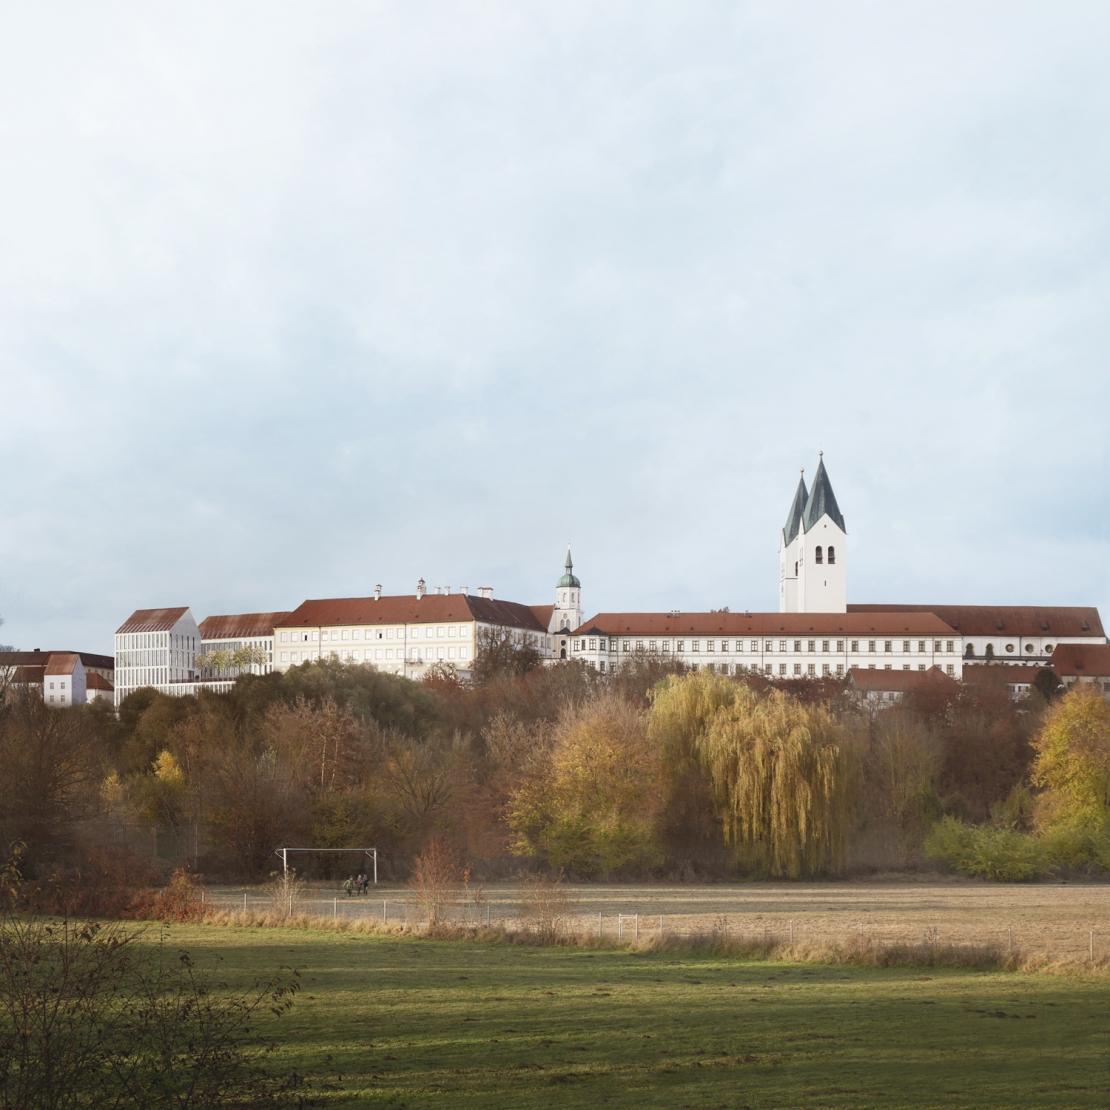 Kardinal Döpfner Haus Domberg Freising